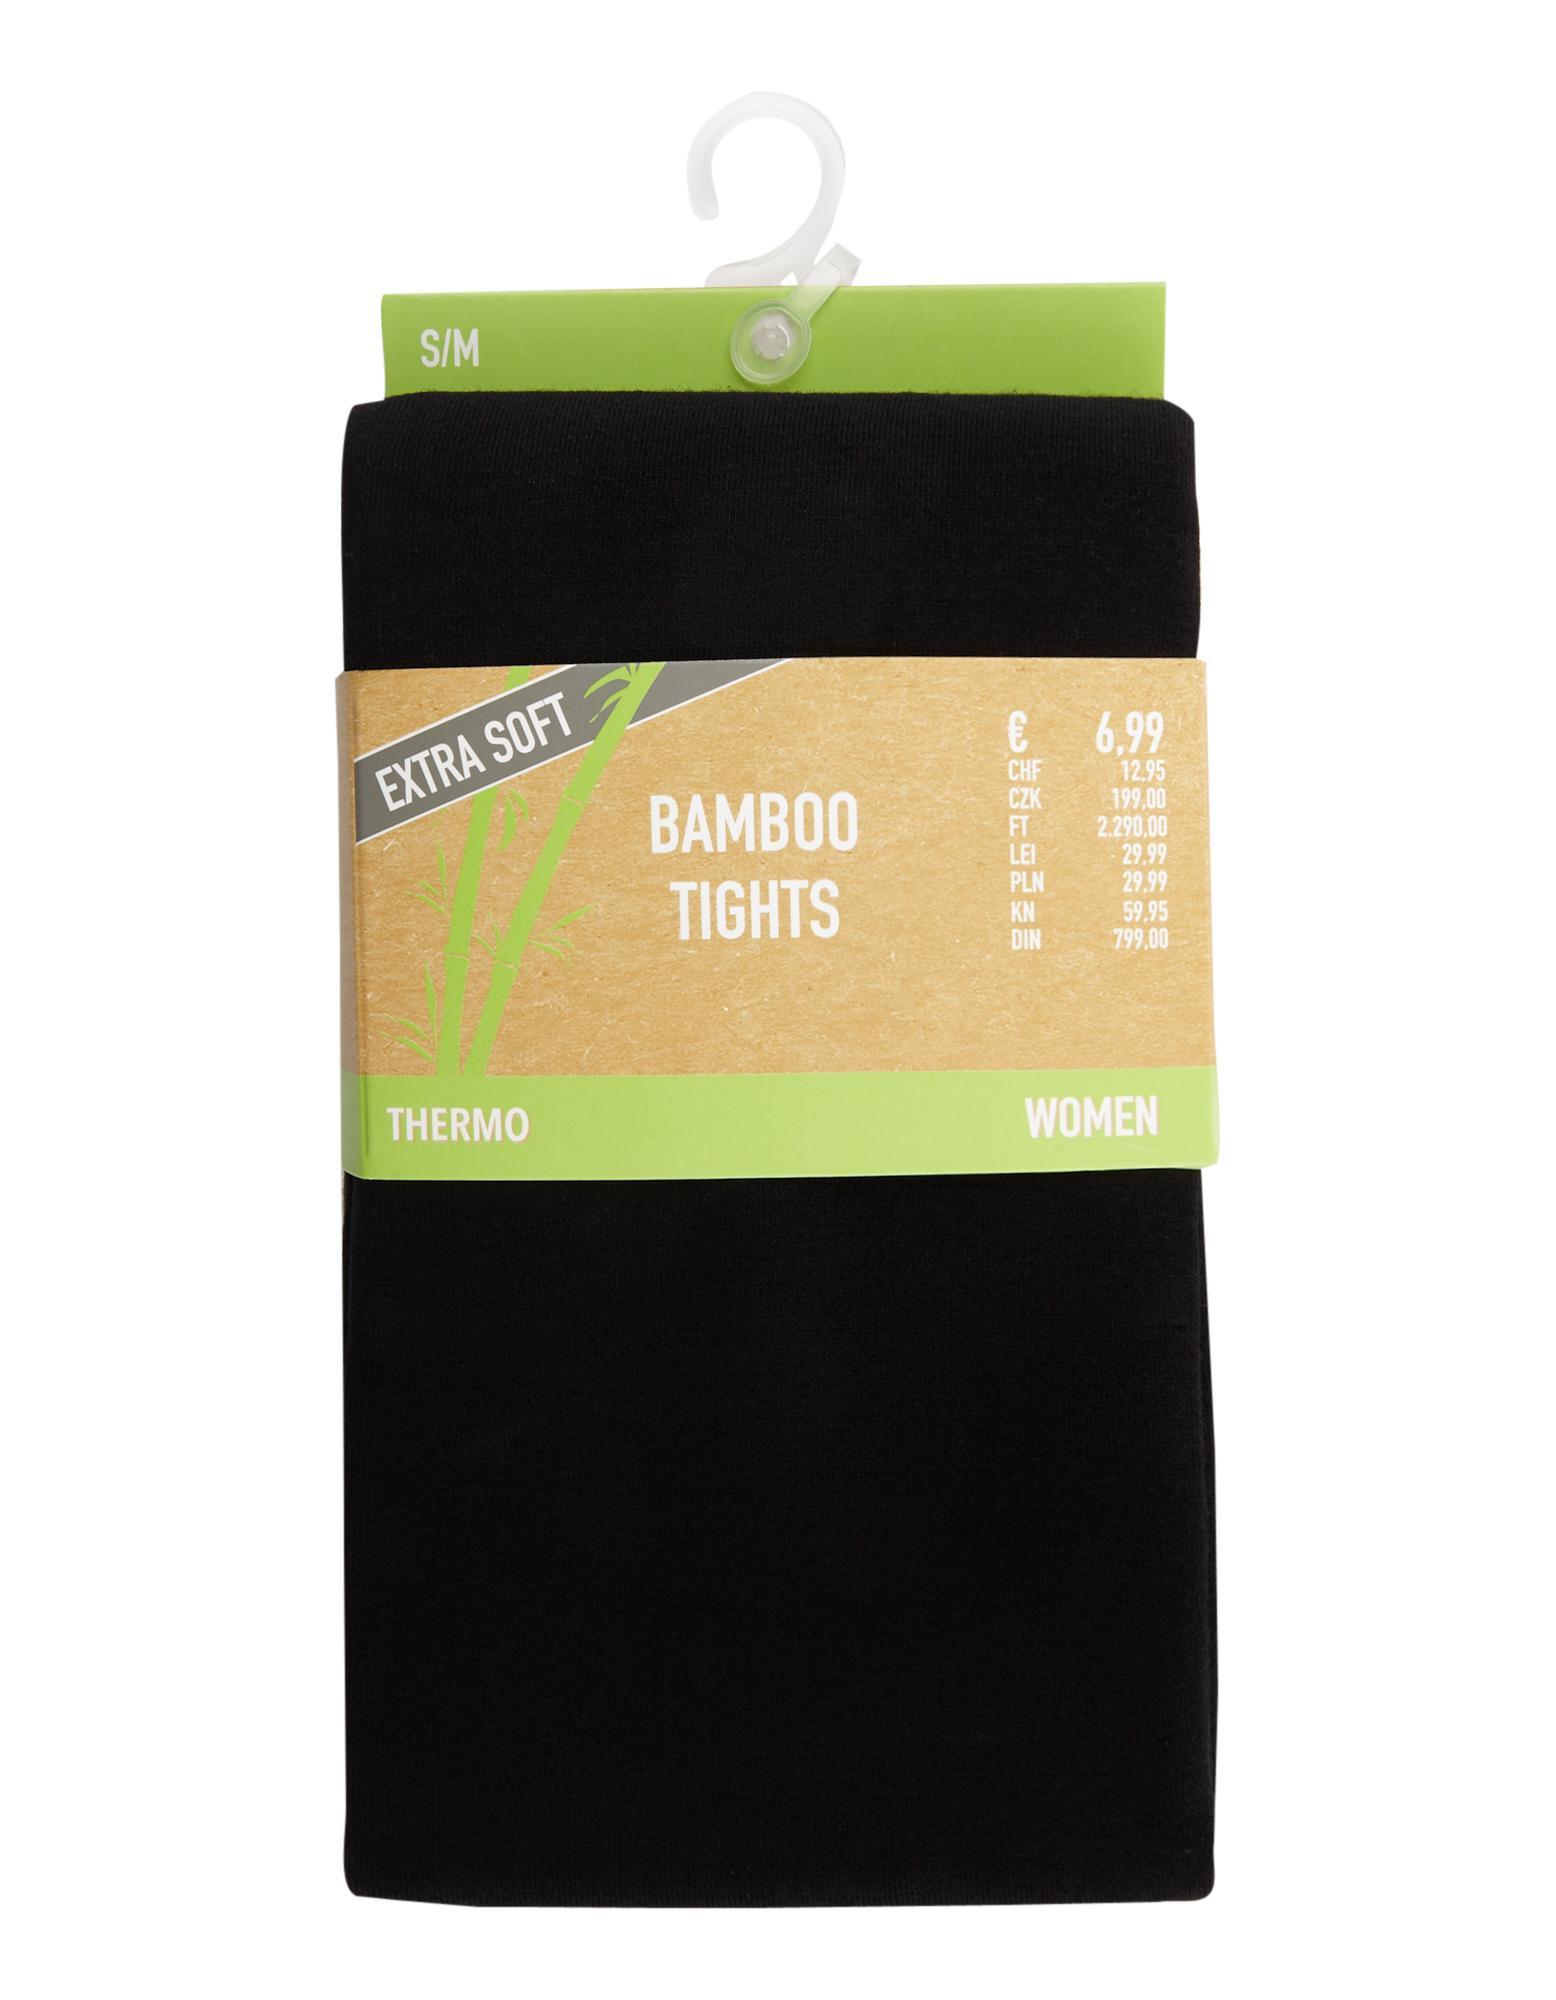 Damen Bamboo Thermo Strumpfhosen mit Komfortbund    81575831900300